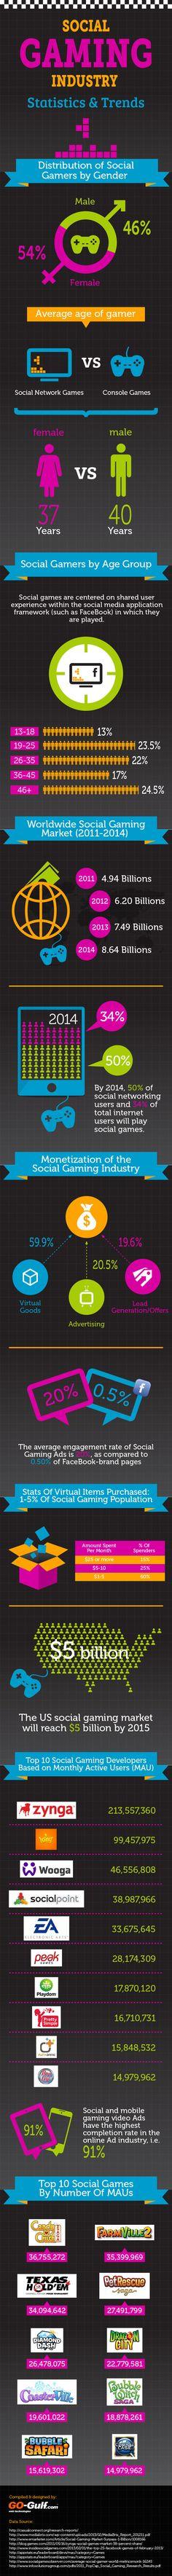 Social Gaming Industry – Statistics & Trends